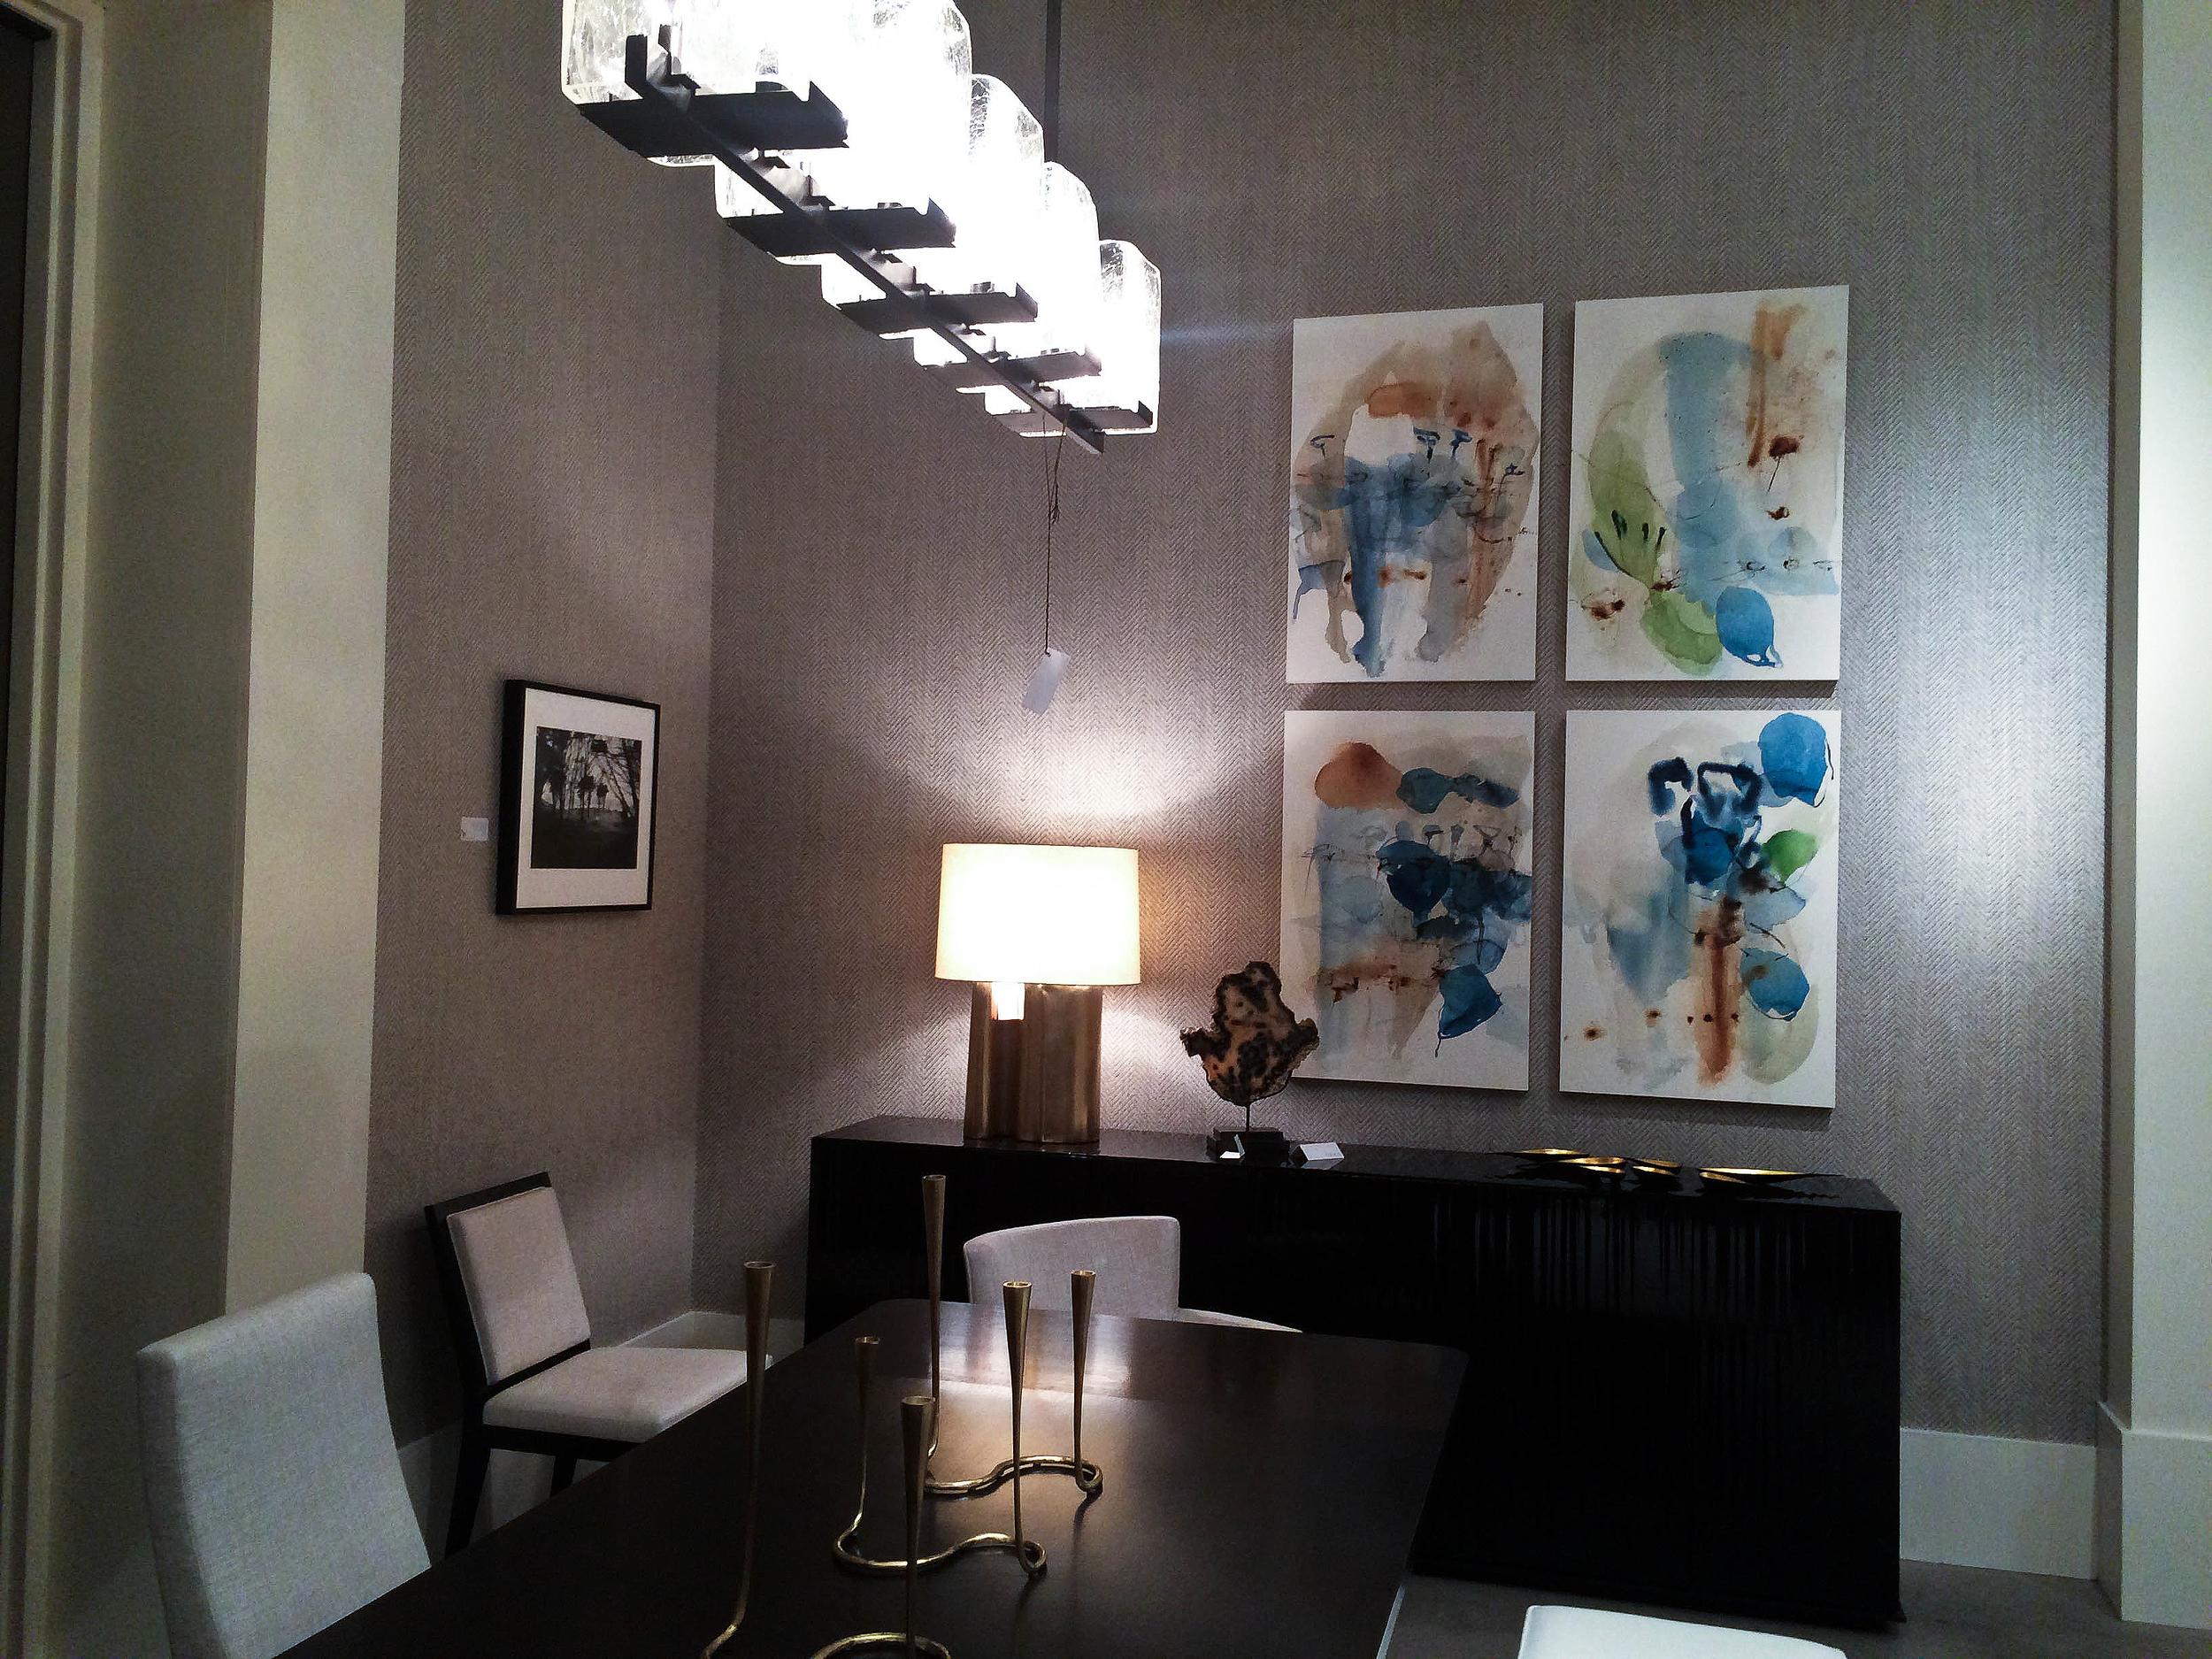 TOWN Studio. Design: Mikhail Dantes. Photography: Abbey Arlt. Artists: Anne Arden McDonald (left), Ana Zanic (right).